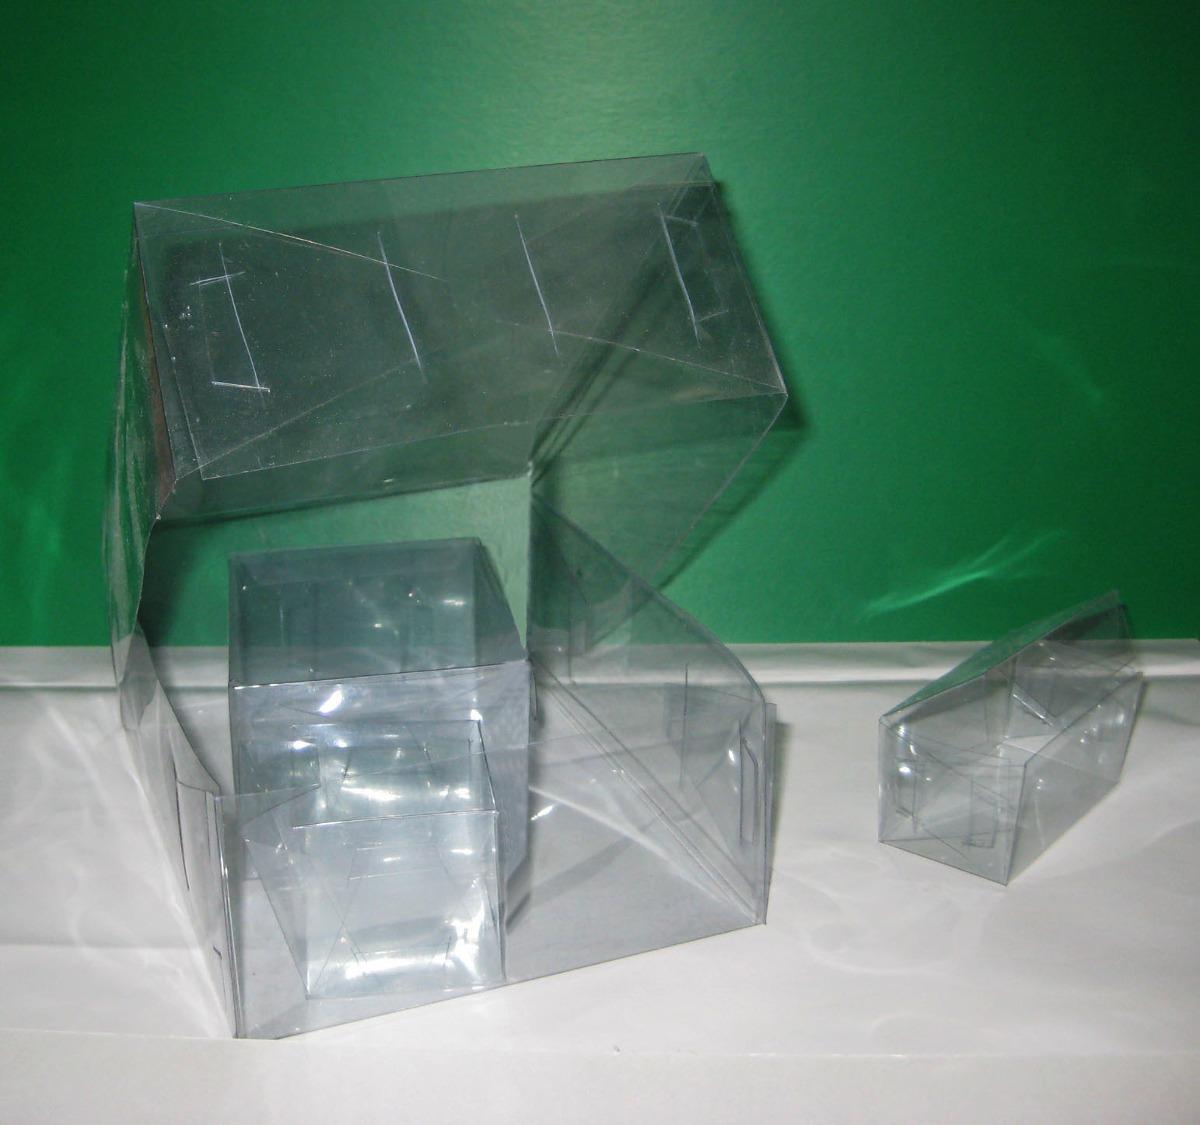 Cajas transparentes acetato pvc cualquier medida - Laminas de plastico transparente ...